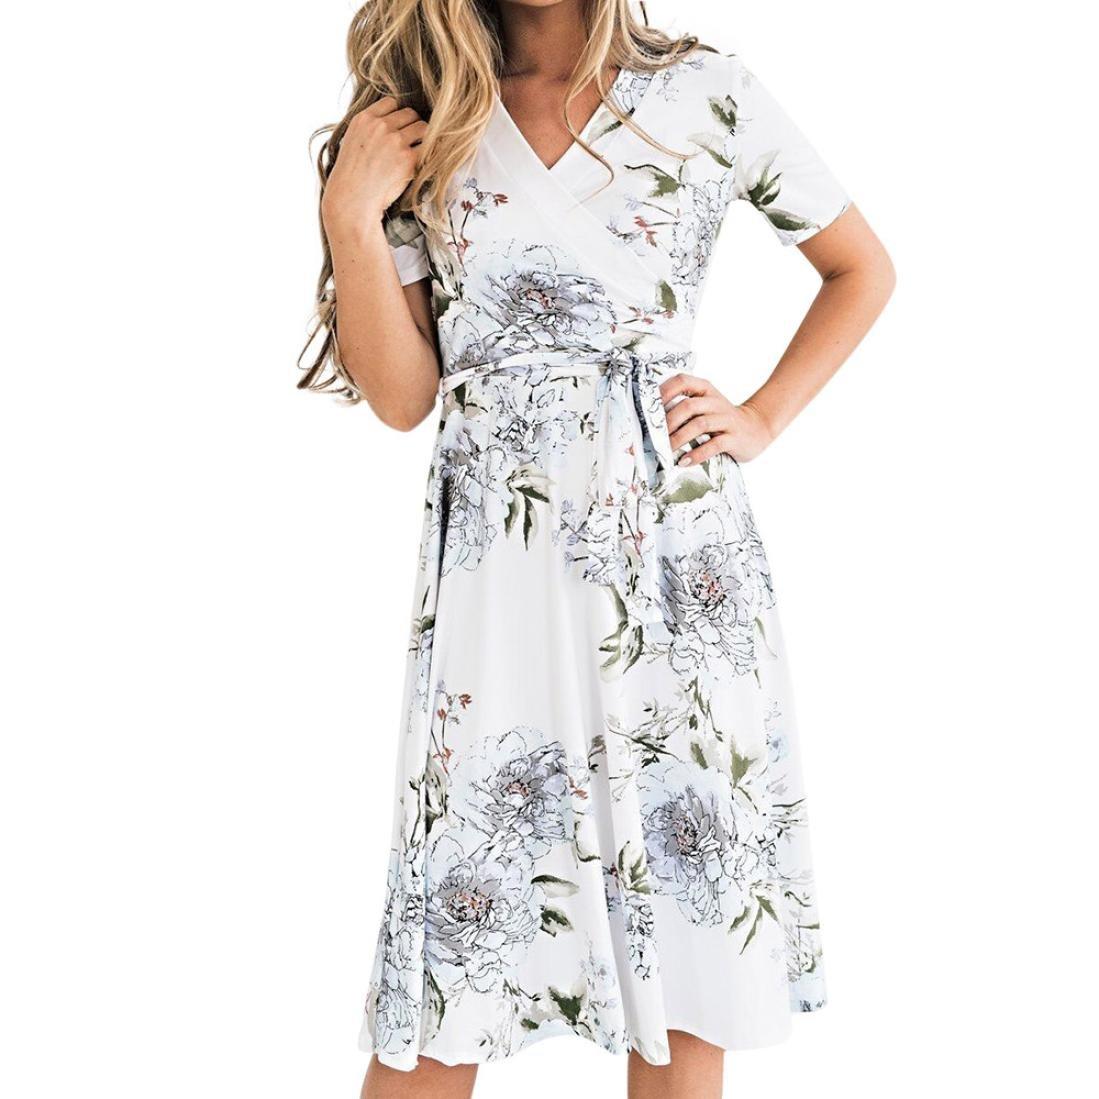 a43ebbb939 Beach Dresses Amazon Uk – DACC